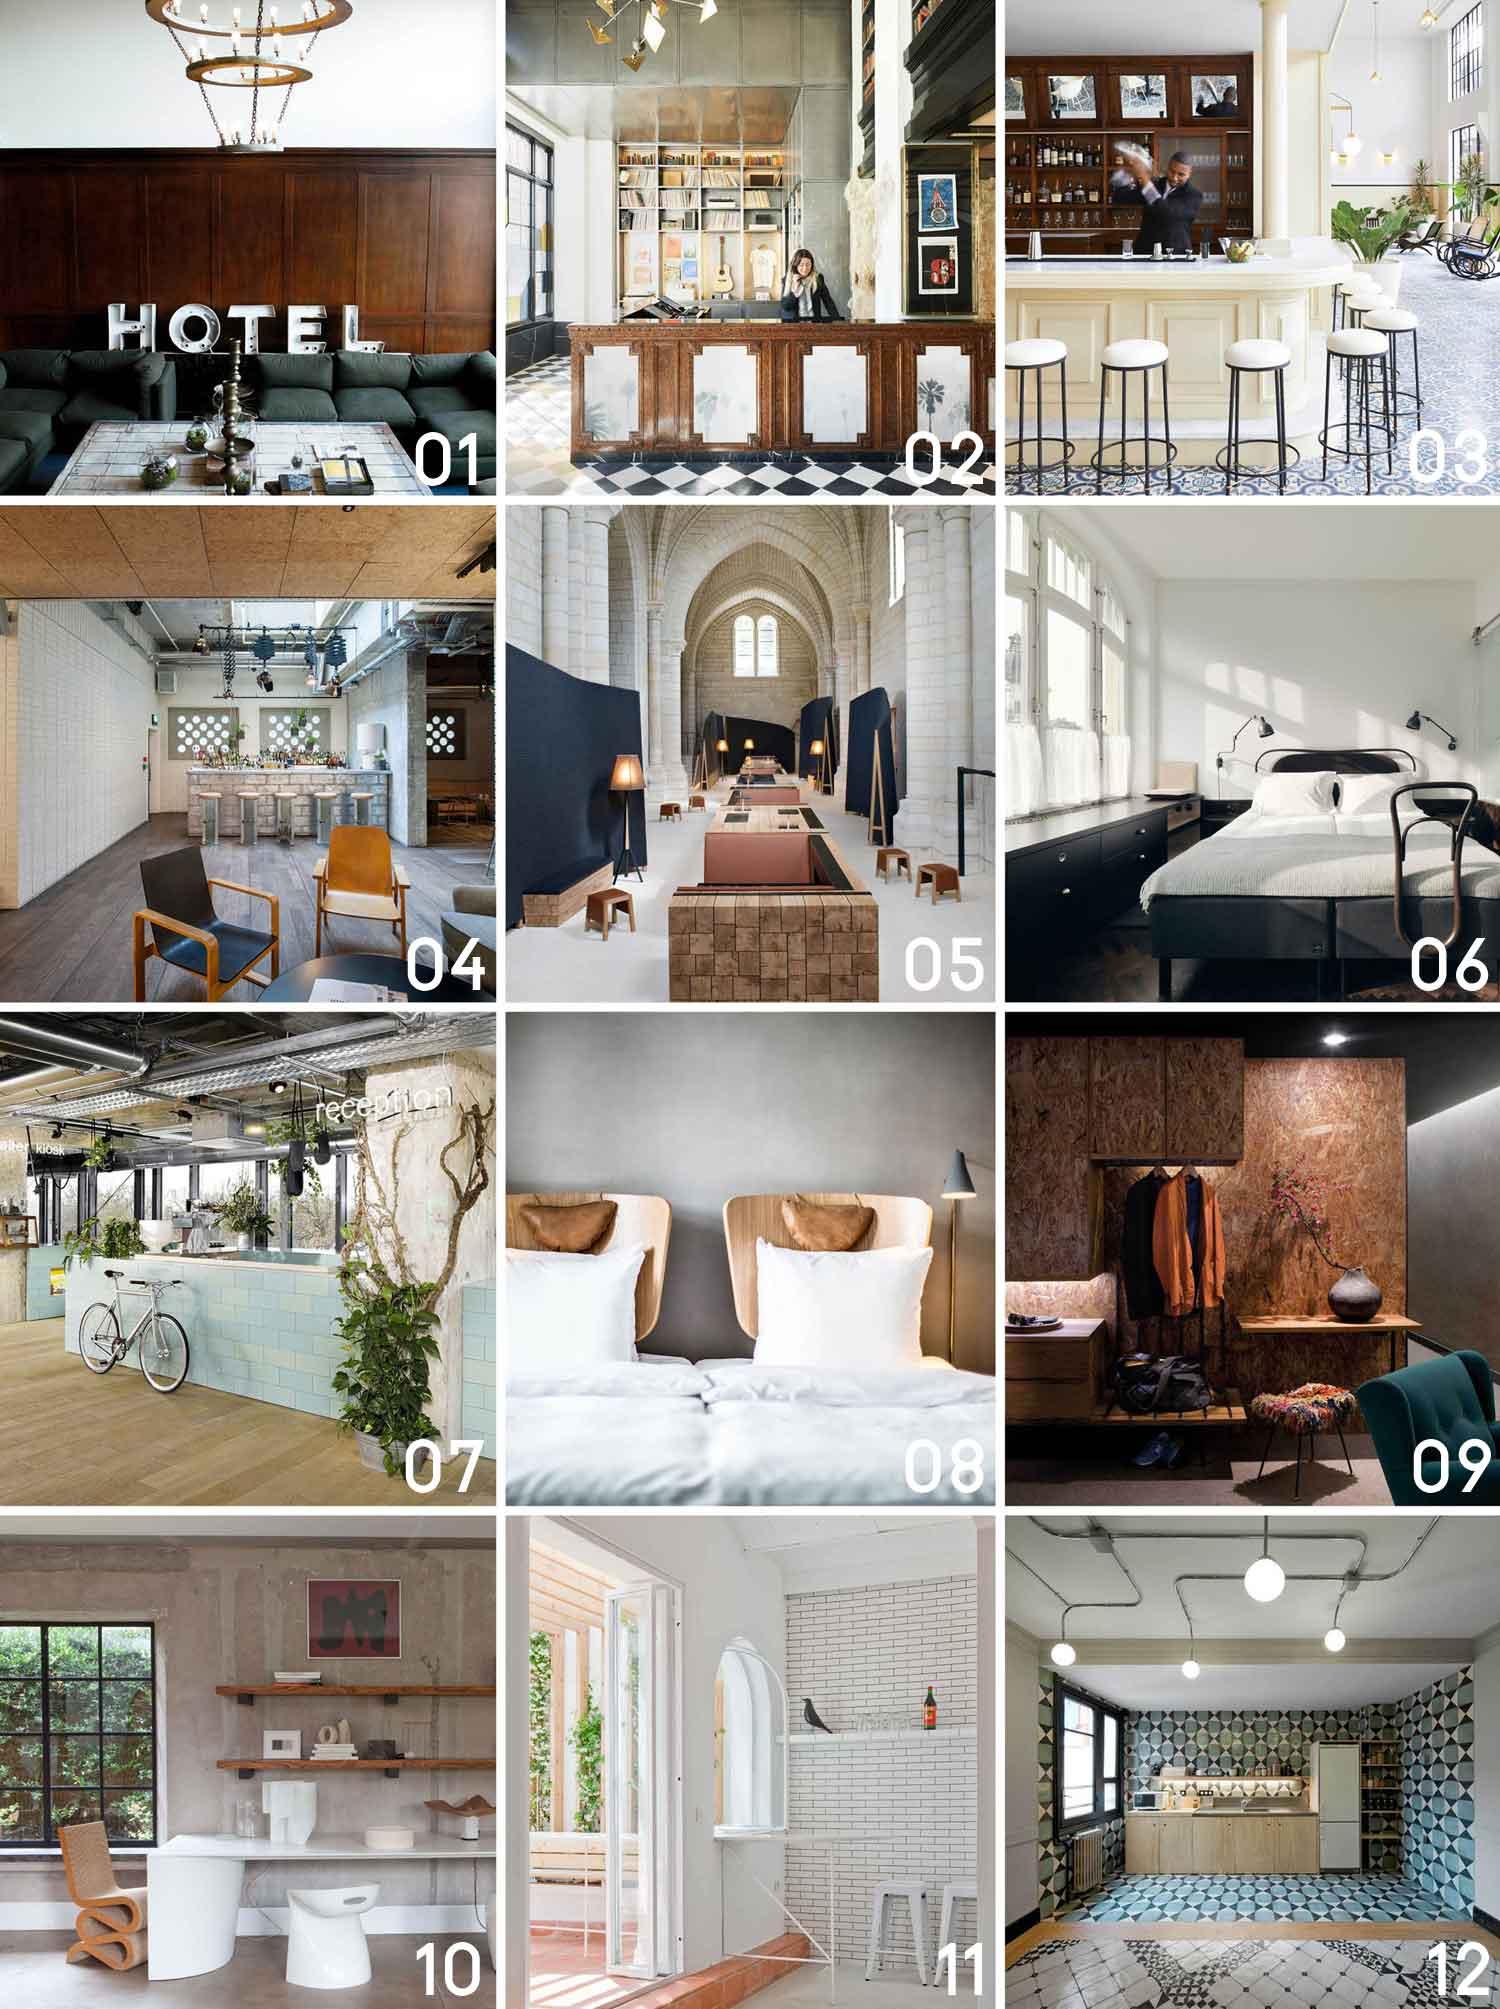 Hotel Interior Design 2014 Archives | Yellowtrace